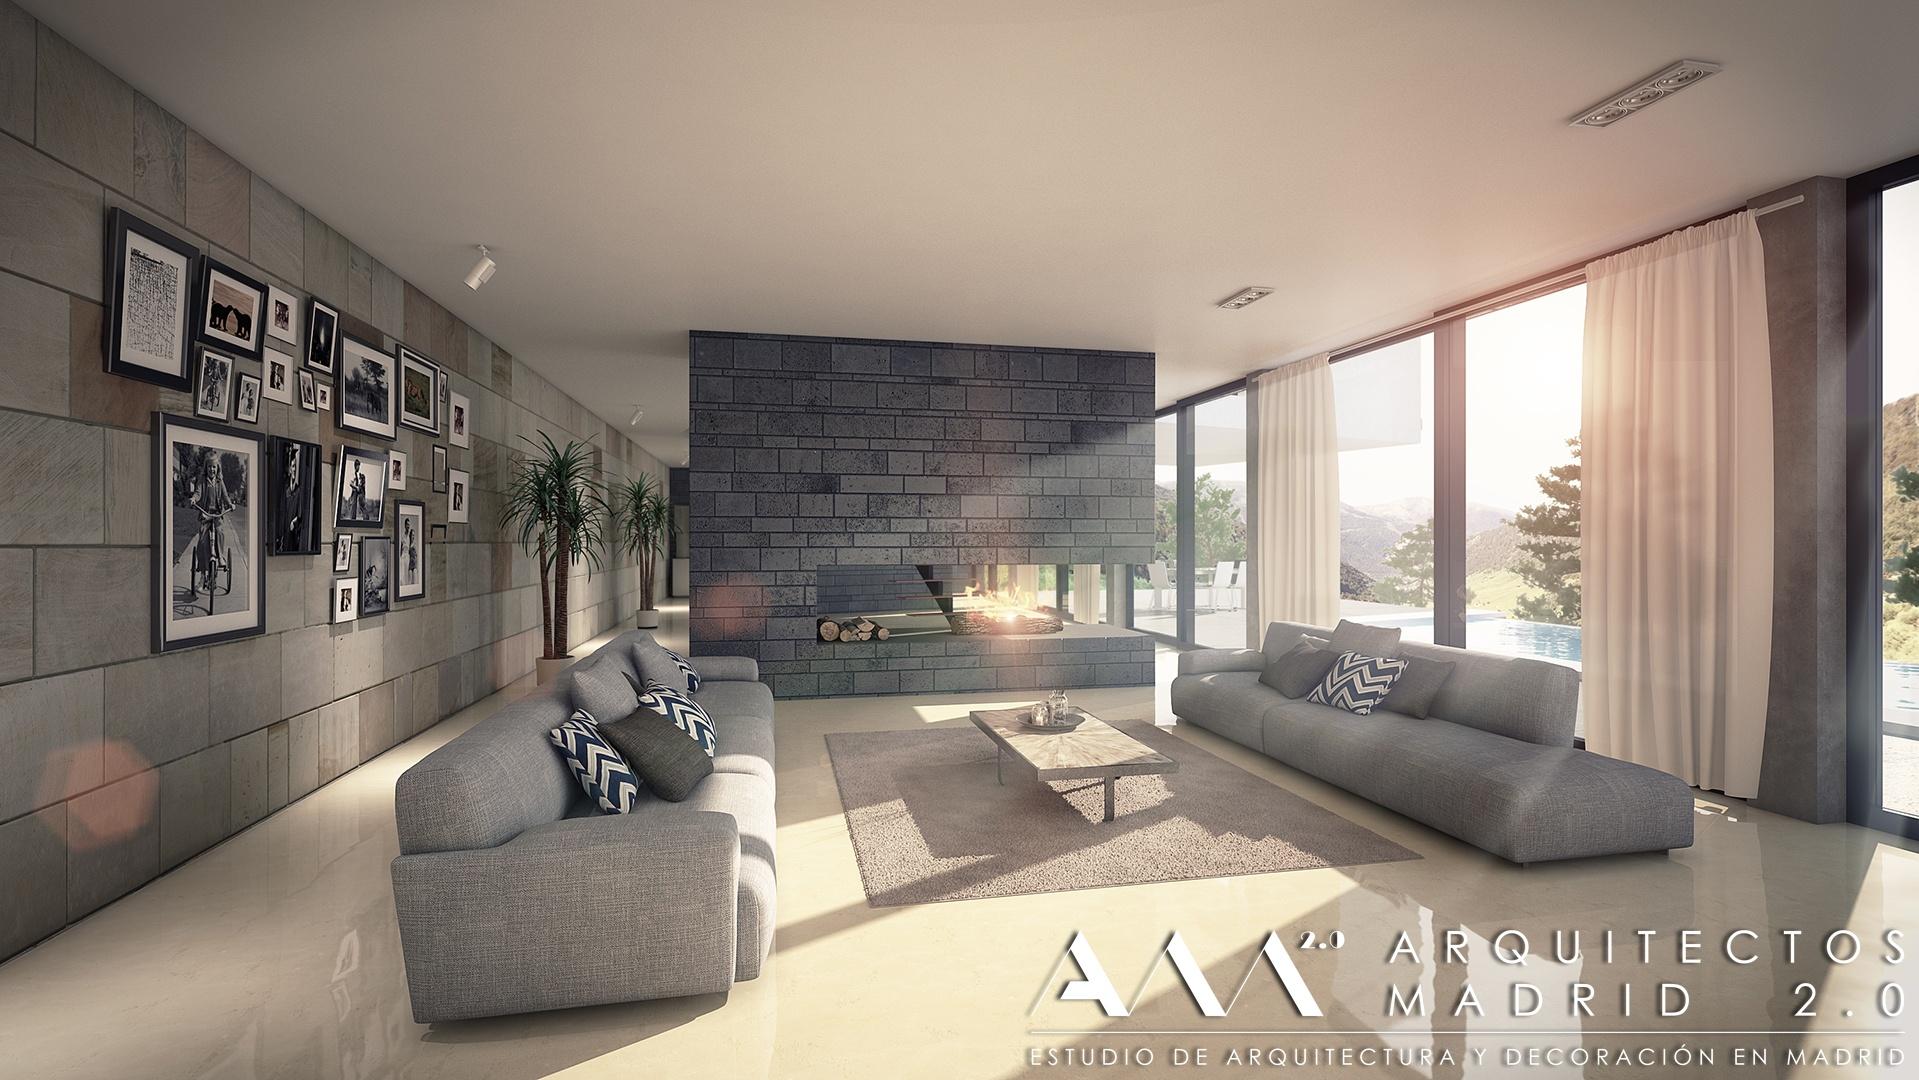 arquitectos-madrid-estudio-arquitectura-en-madrid-proyectos-casas-modernas-06